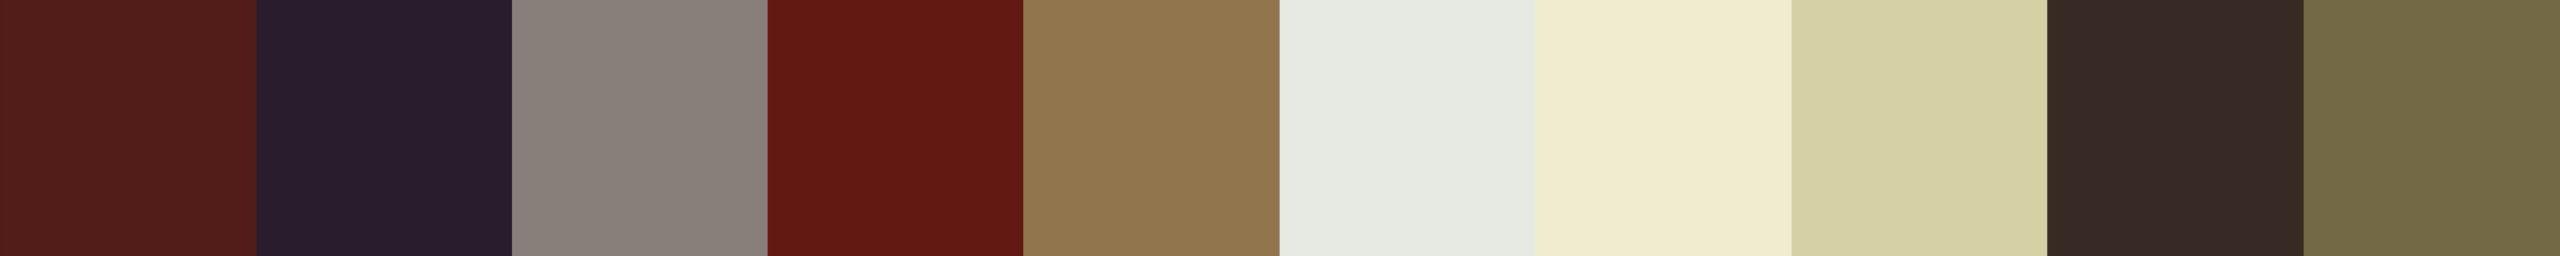 18 Kleidonia Color Palette